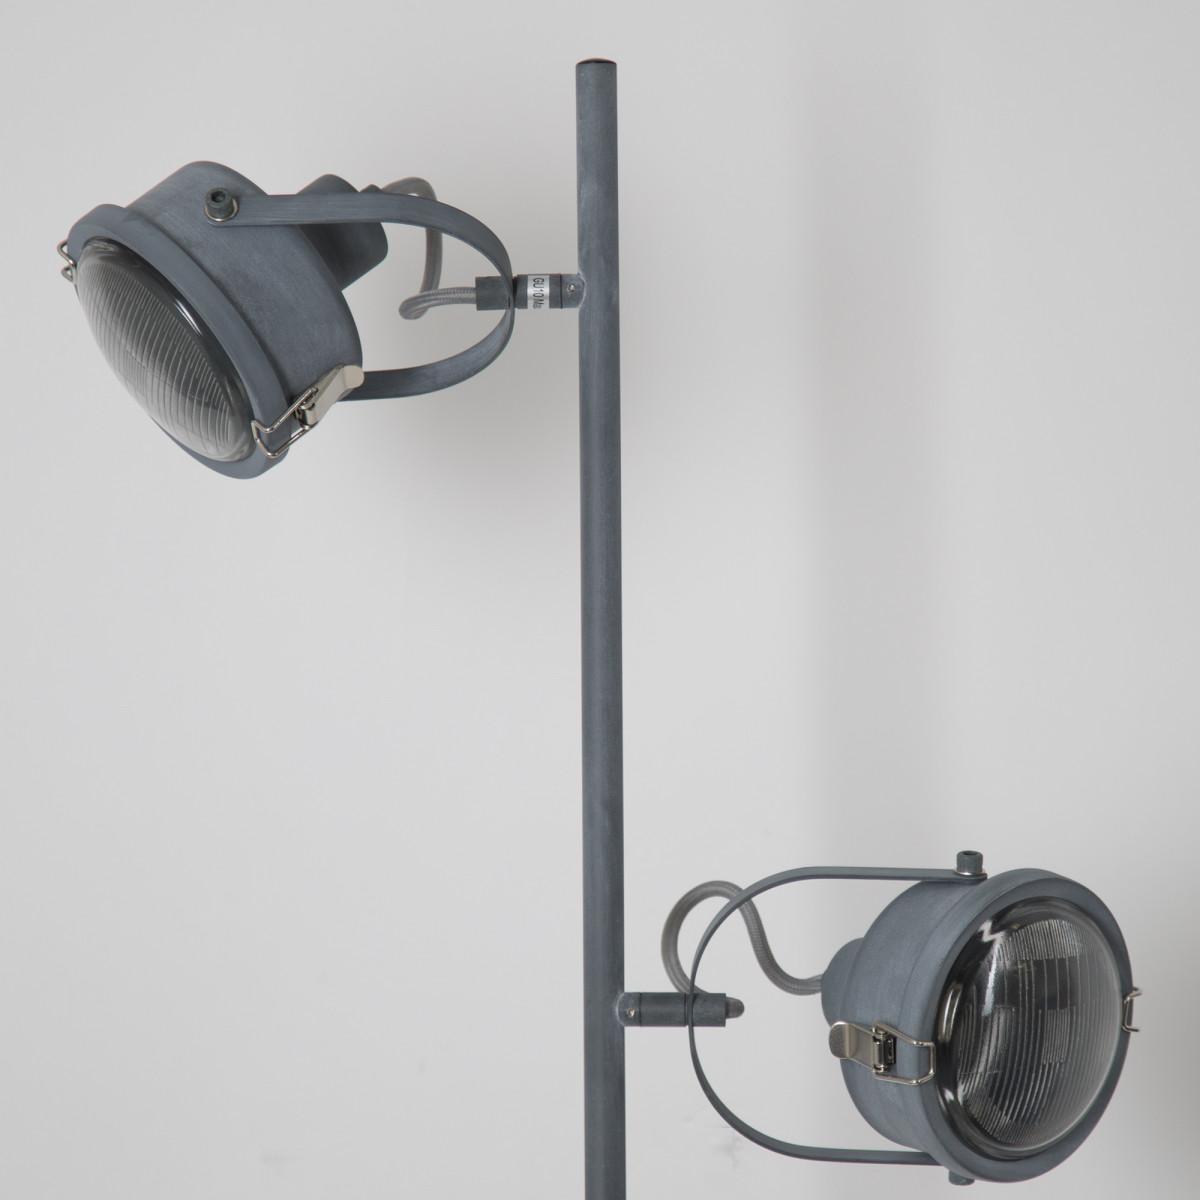 Satellite stehlampe grau